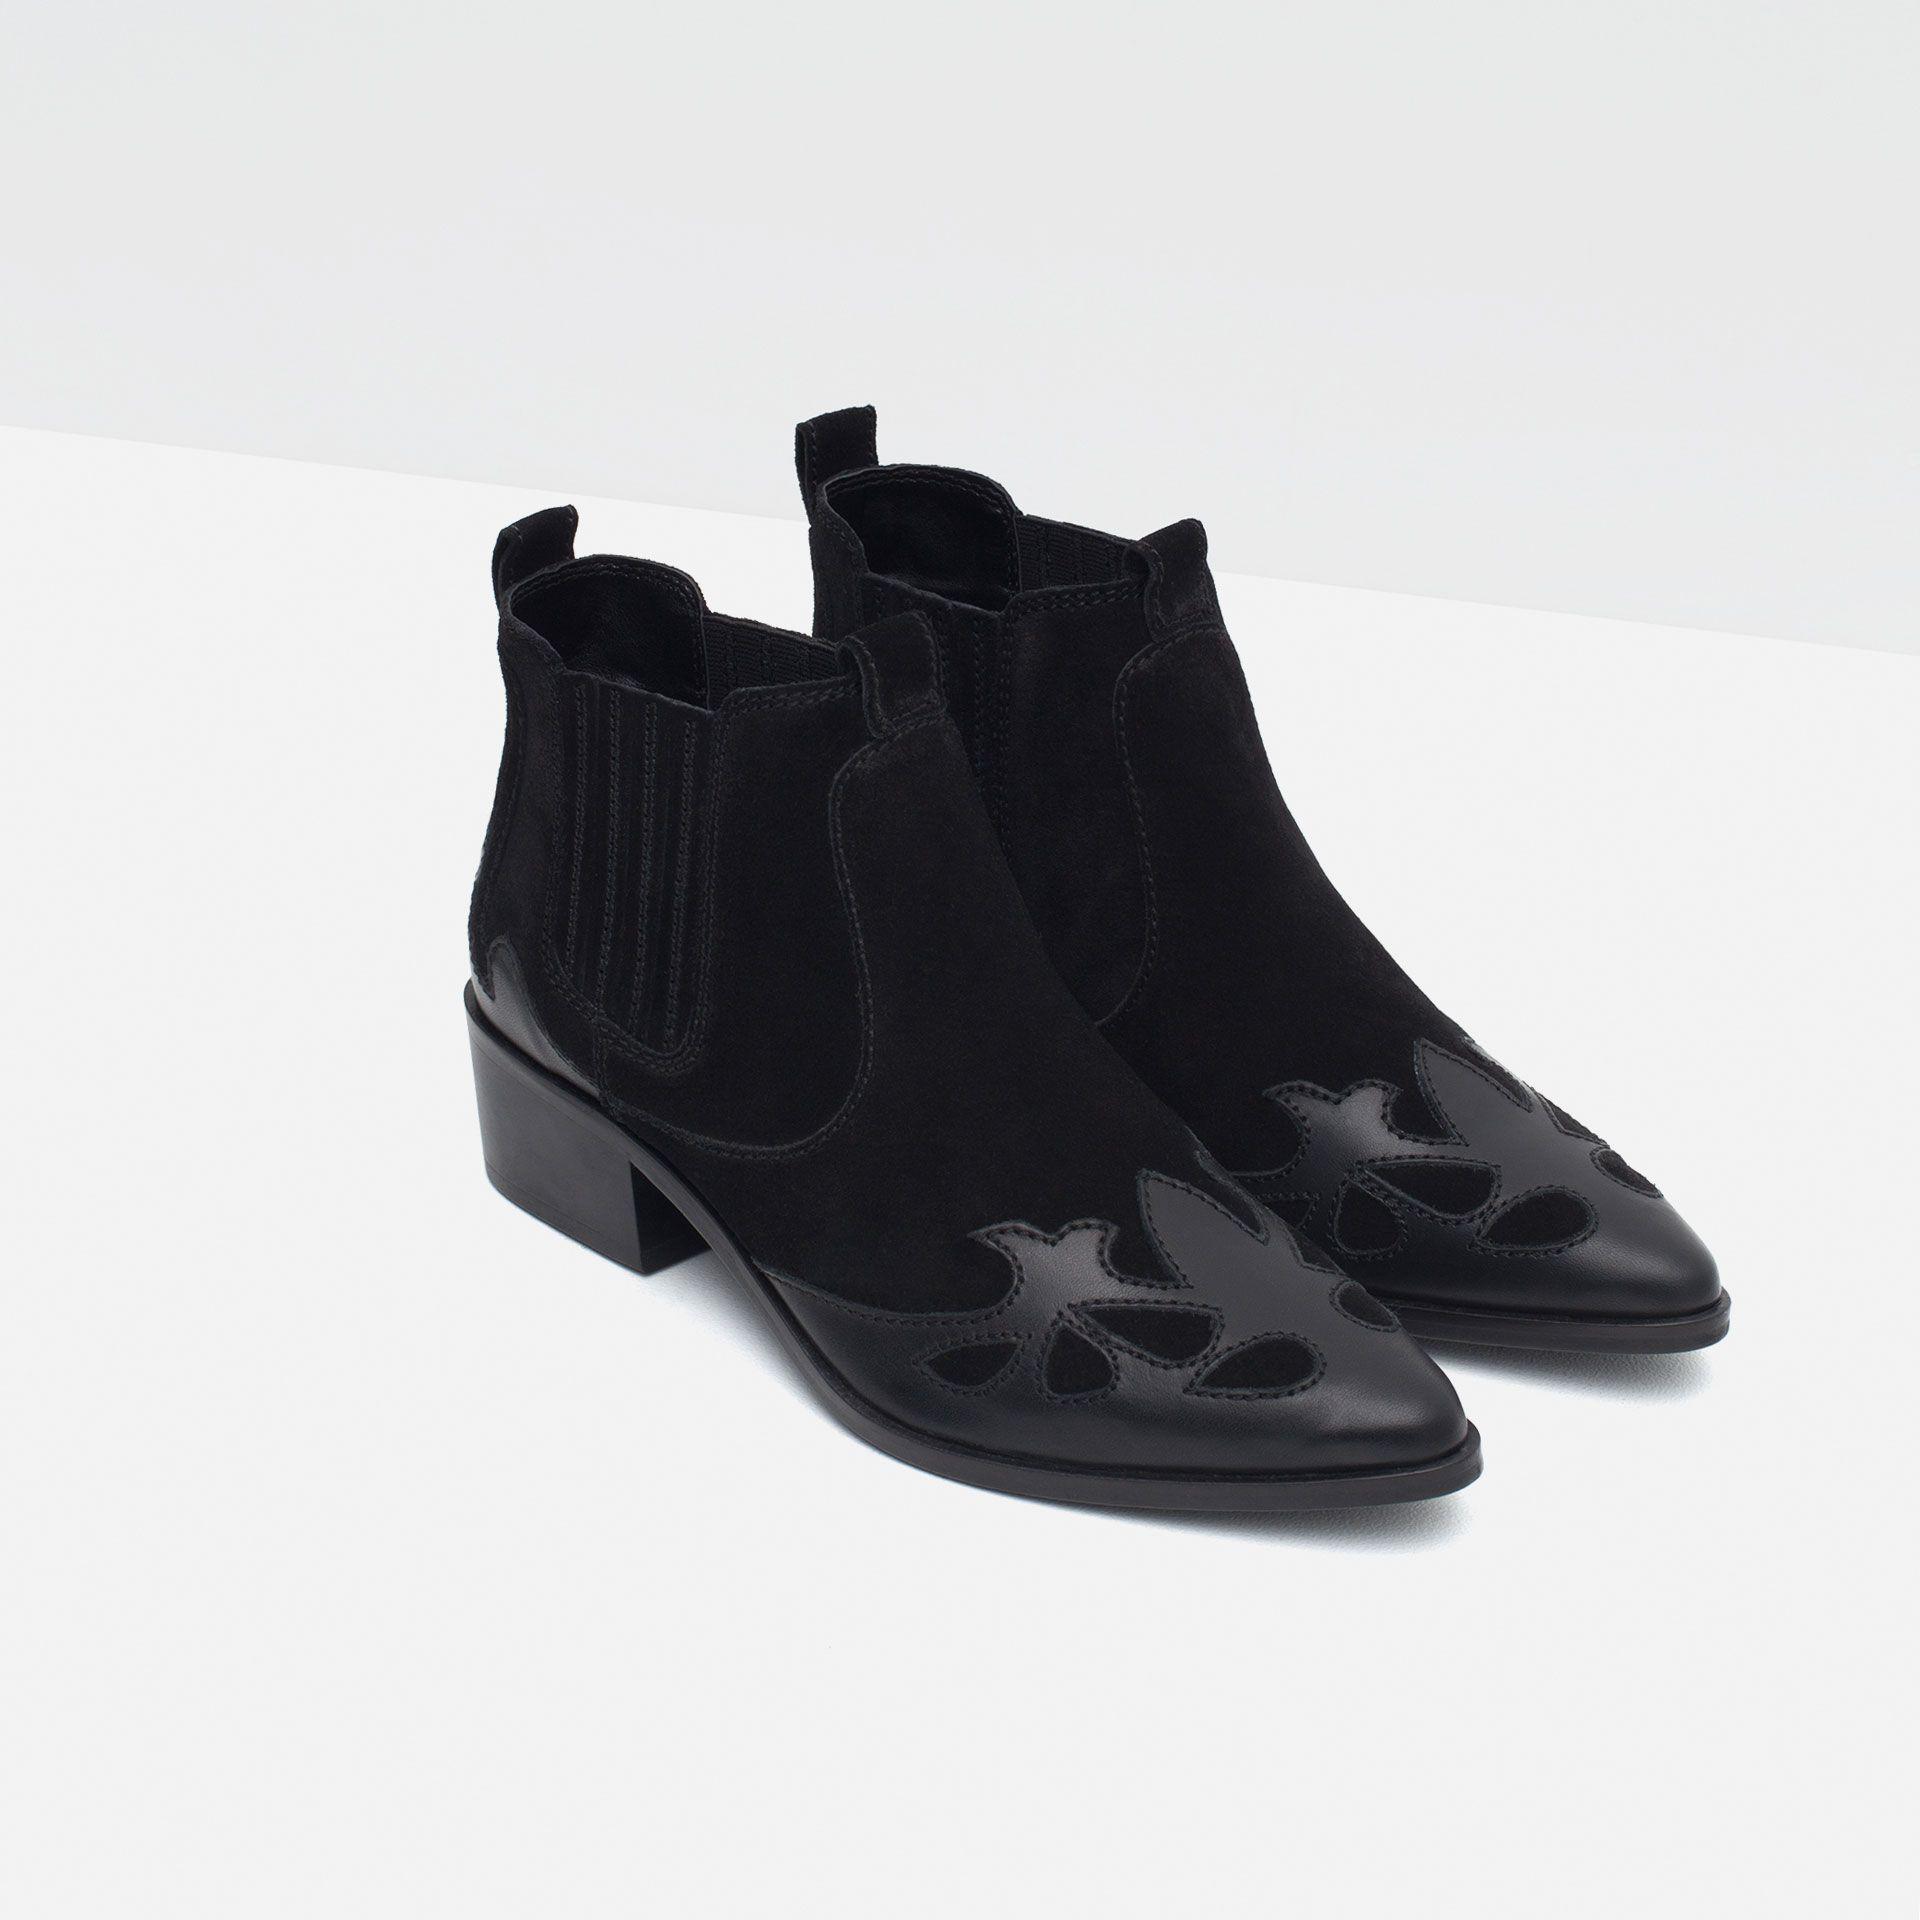 Bottines Cow Boy À Talons En Cuir Chaussures Trf Collection Ss16 Lederschuhe Damen Stiefel Stiefeletten Damen